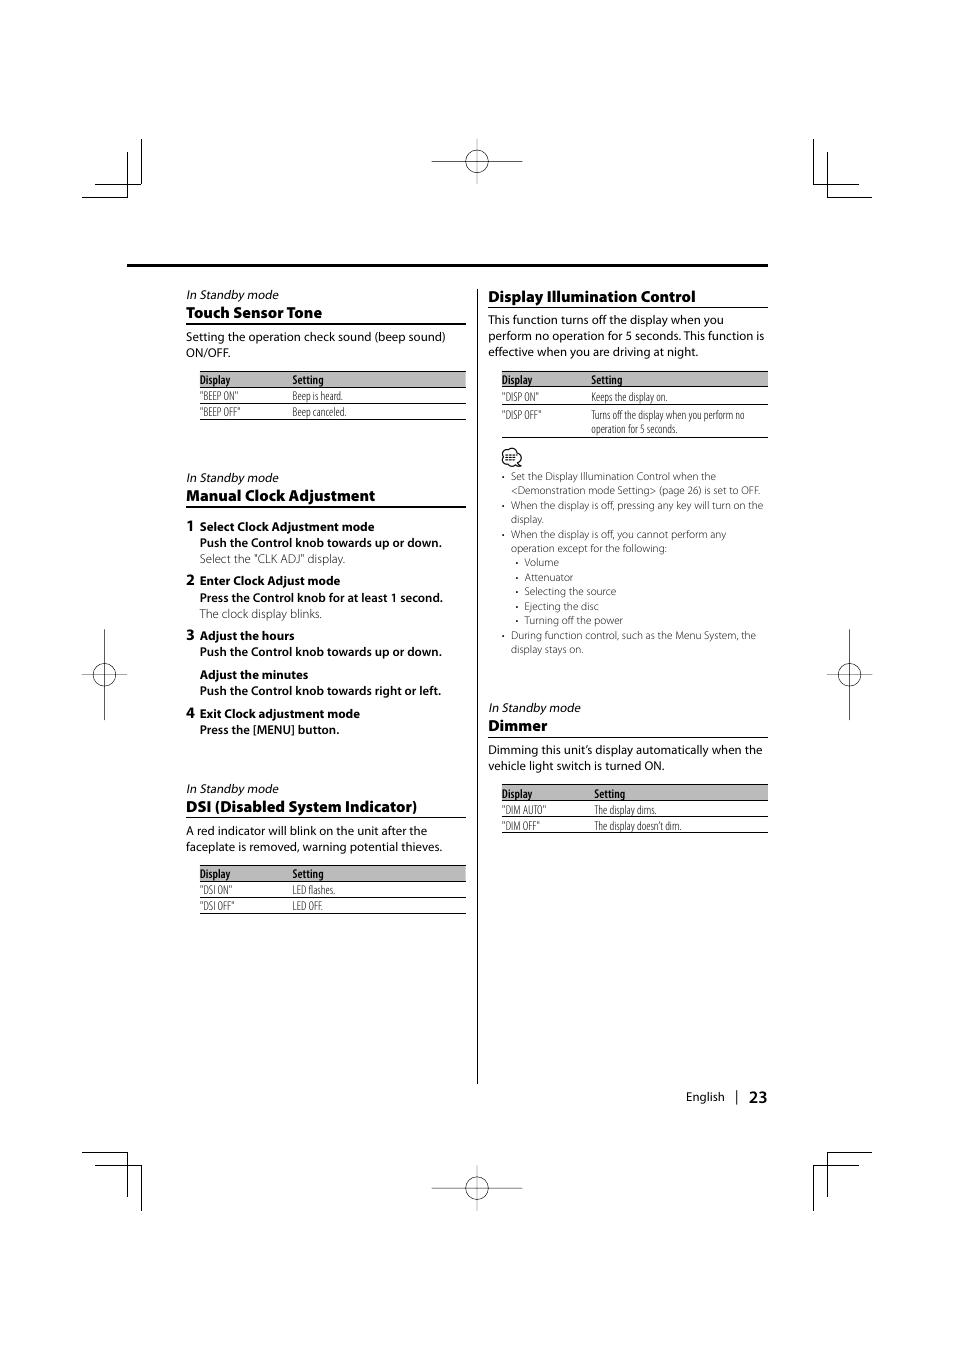 kenwood kdc mp435u user manual page 23 108 also for kdc x491 rh manualsdir com Kenwood KDC-MP435U Unlock Code Harness Diagram Kenwood KDC-MP345U